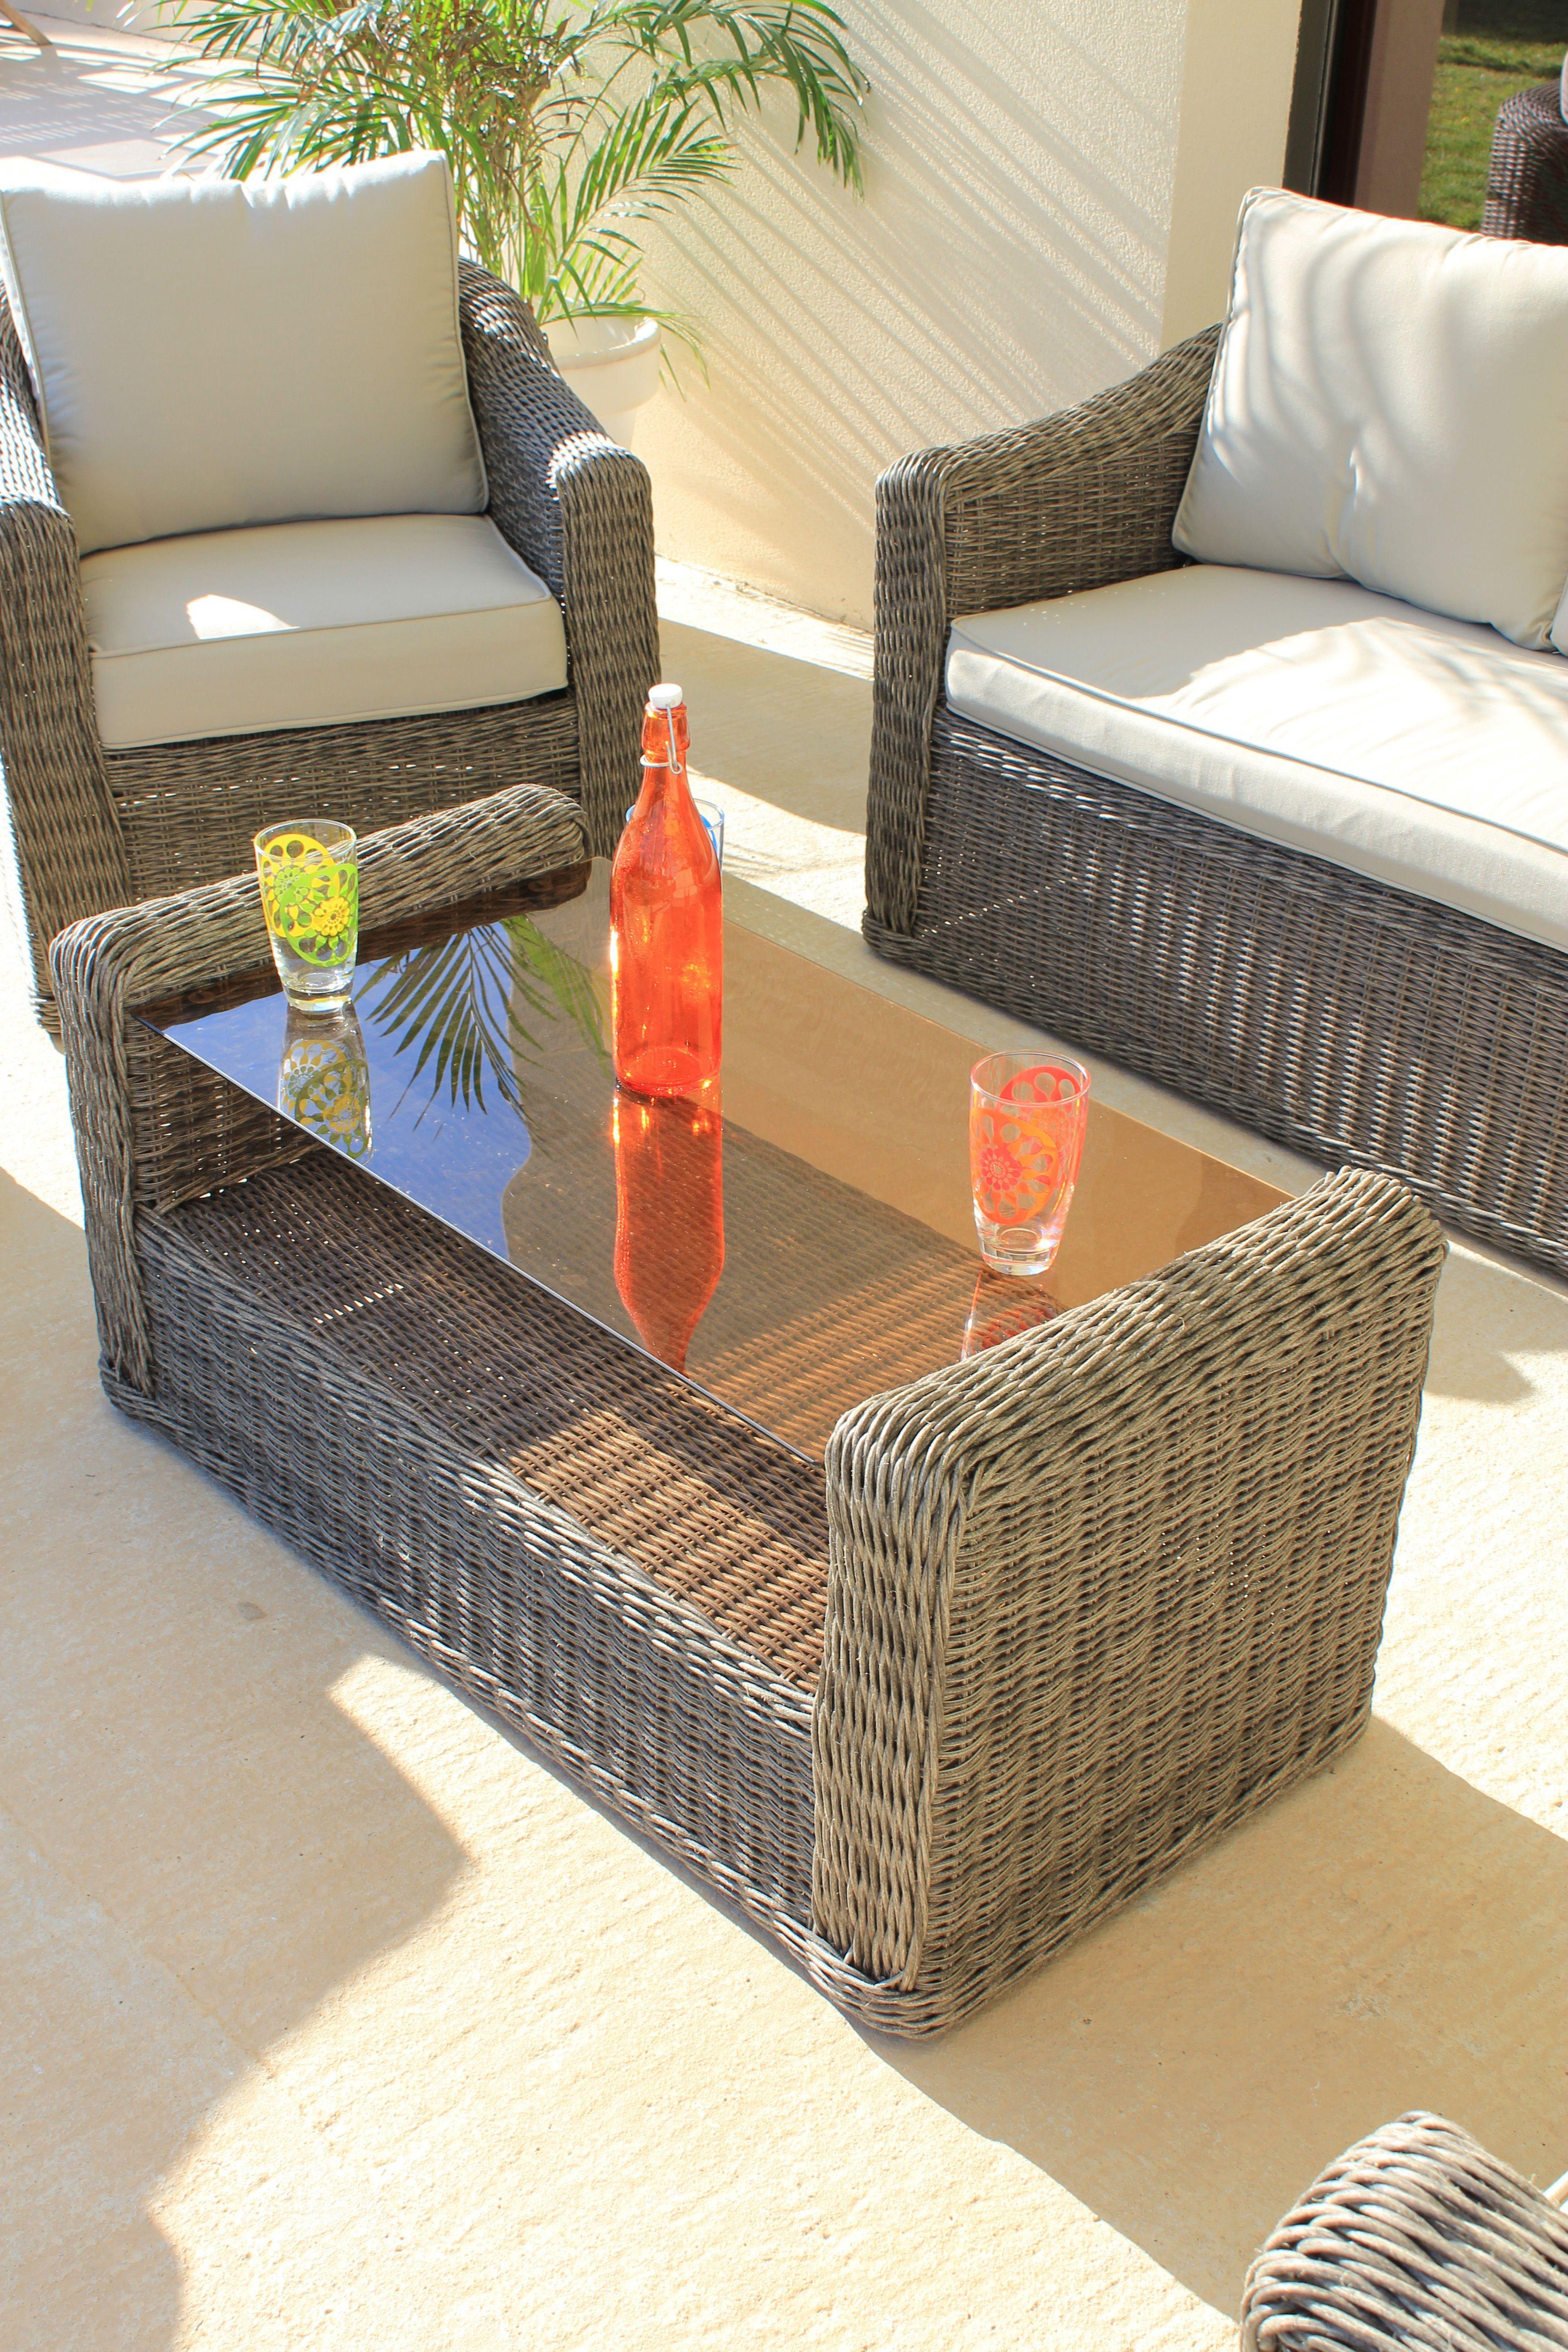 50 Hopital De Salon De Provence Check More At Https Leonstafford Com Hopital De Salon De Provence Outdoor Furniture Outdoor Ottoman Furniture